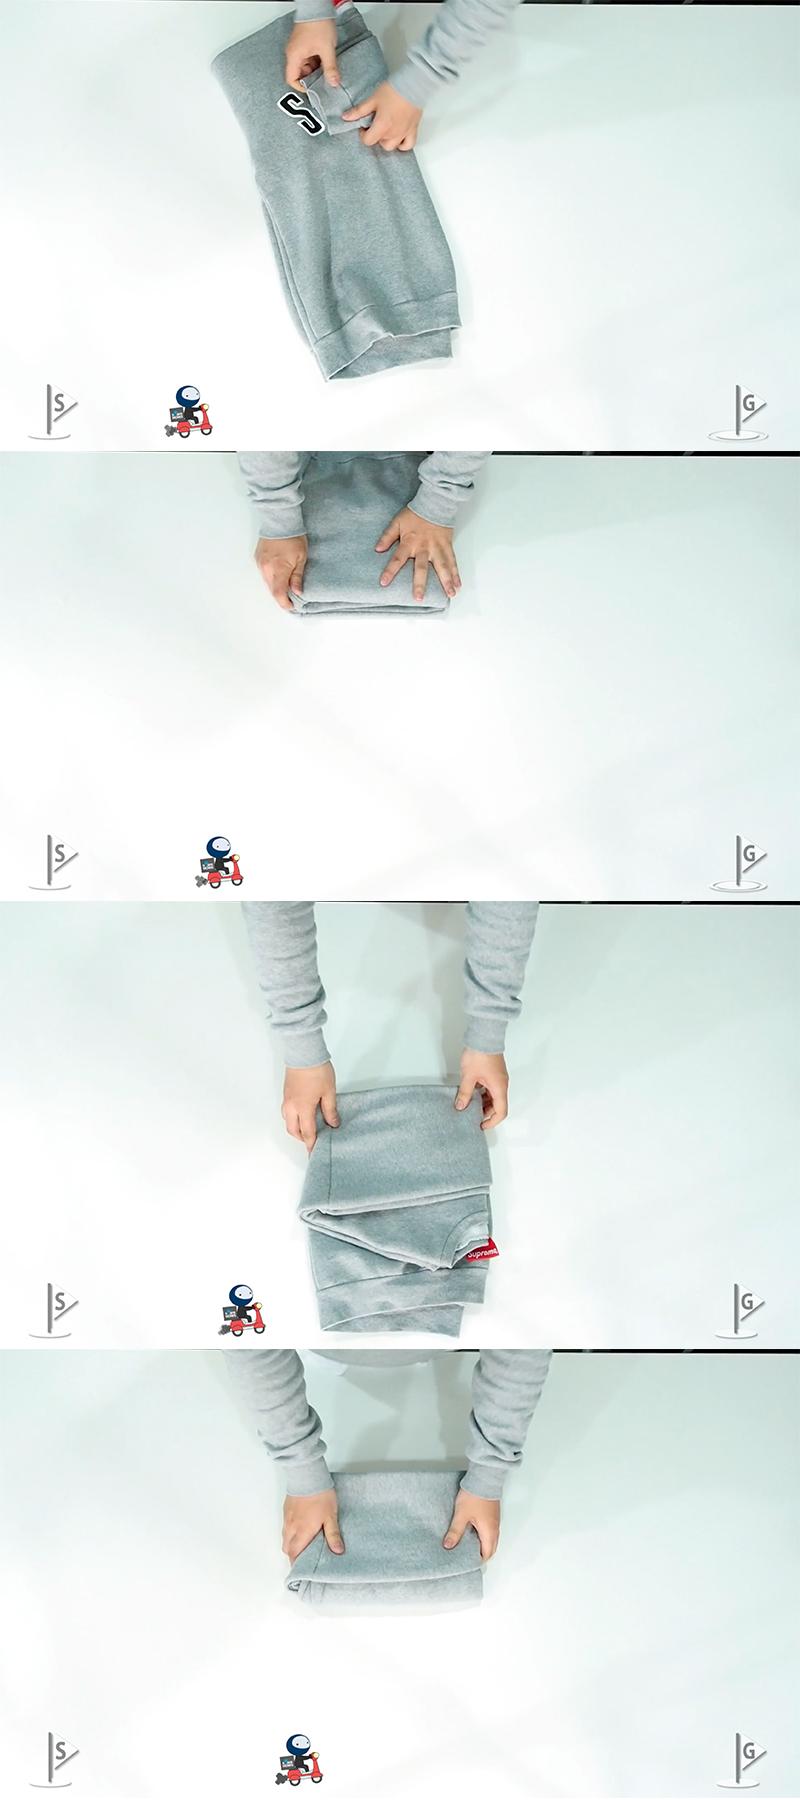 winter clothes hack lifes 02